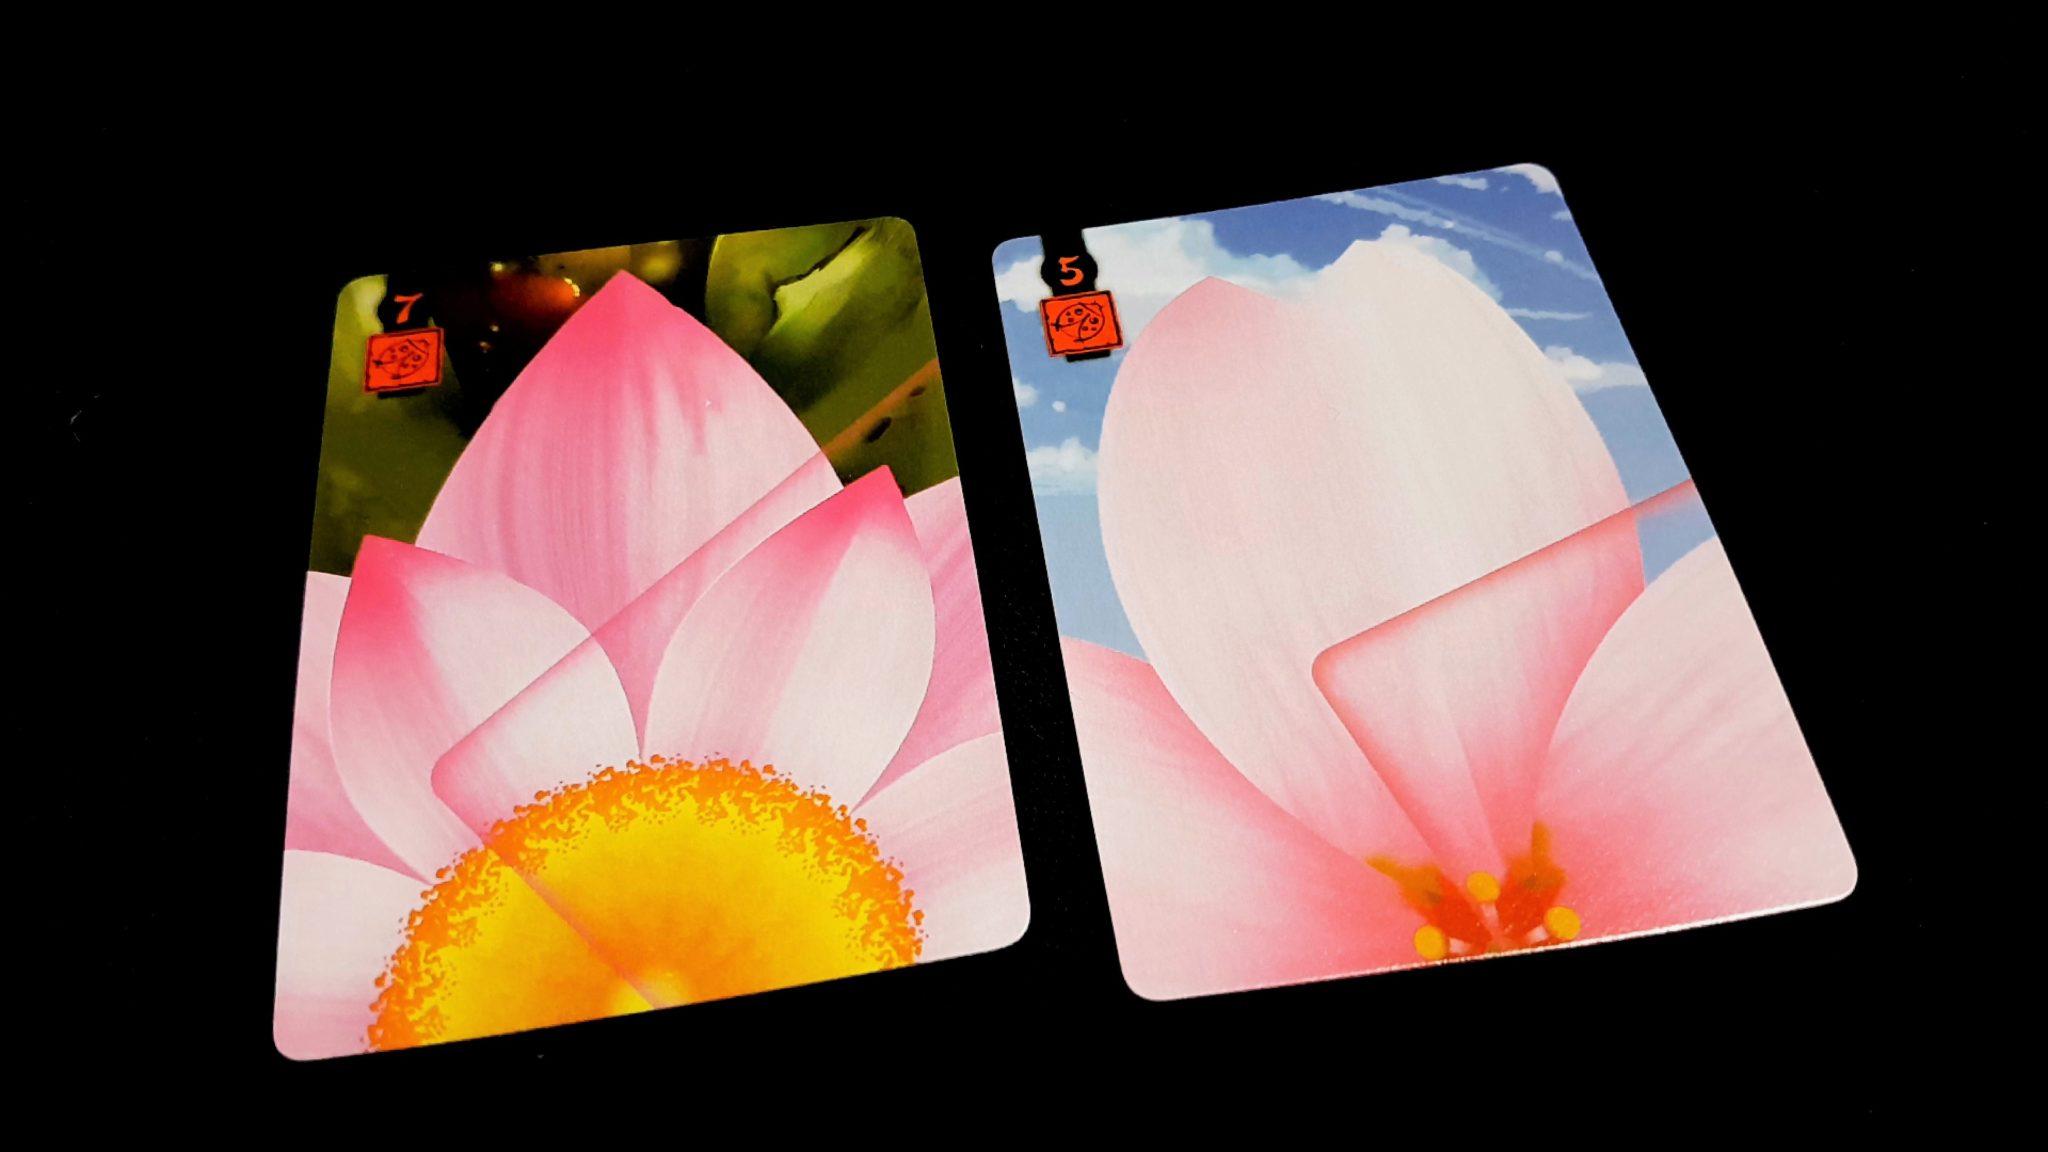 Similar coloured cards